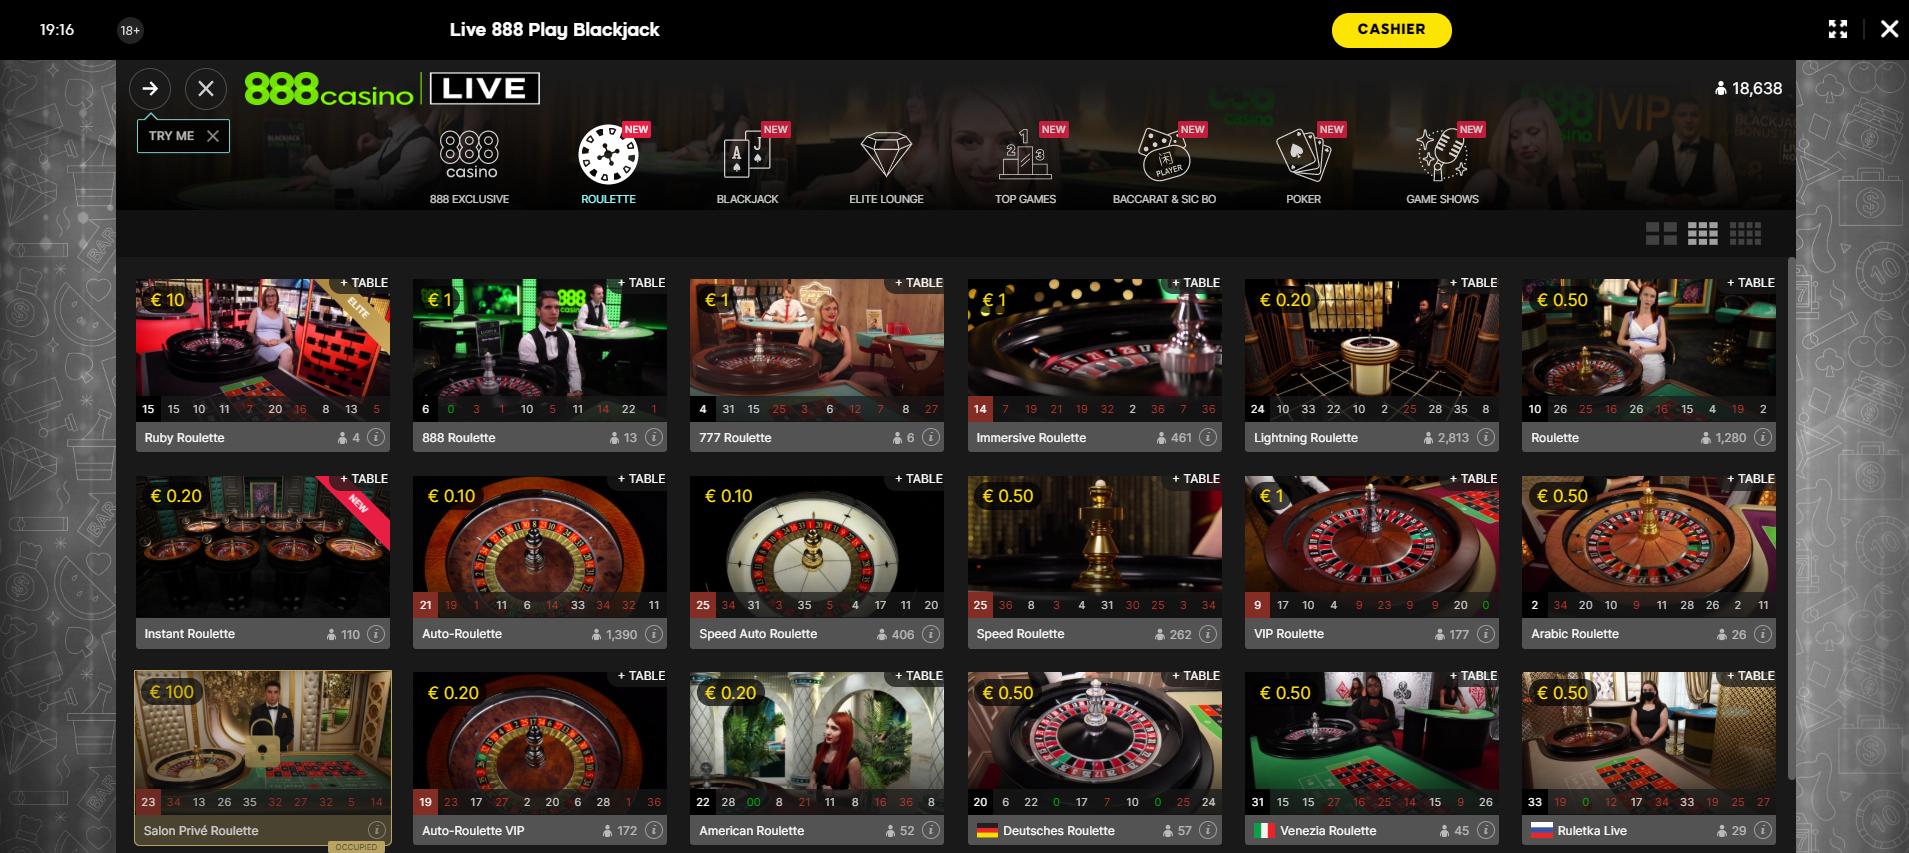 888 casino roulette ruletė gyvai ruletės ratas krupjė